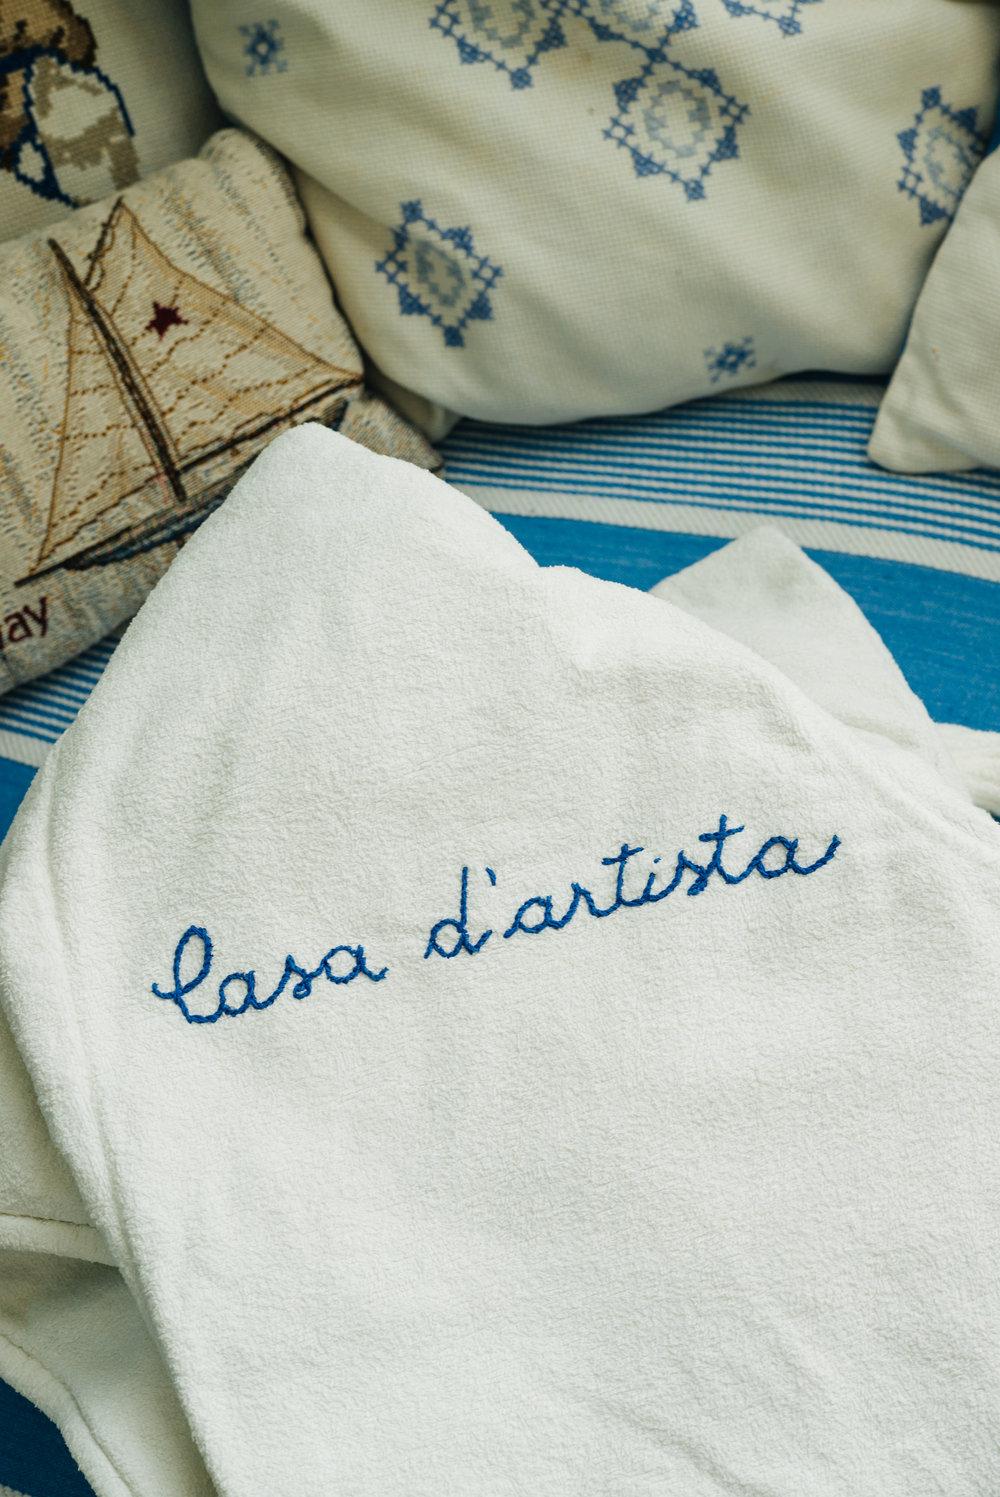 15sampieri-casa-vacanze-sicilia-appartamento-sicily-holiday-apartment-casazzurra-italia-italy.jpg